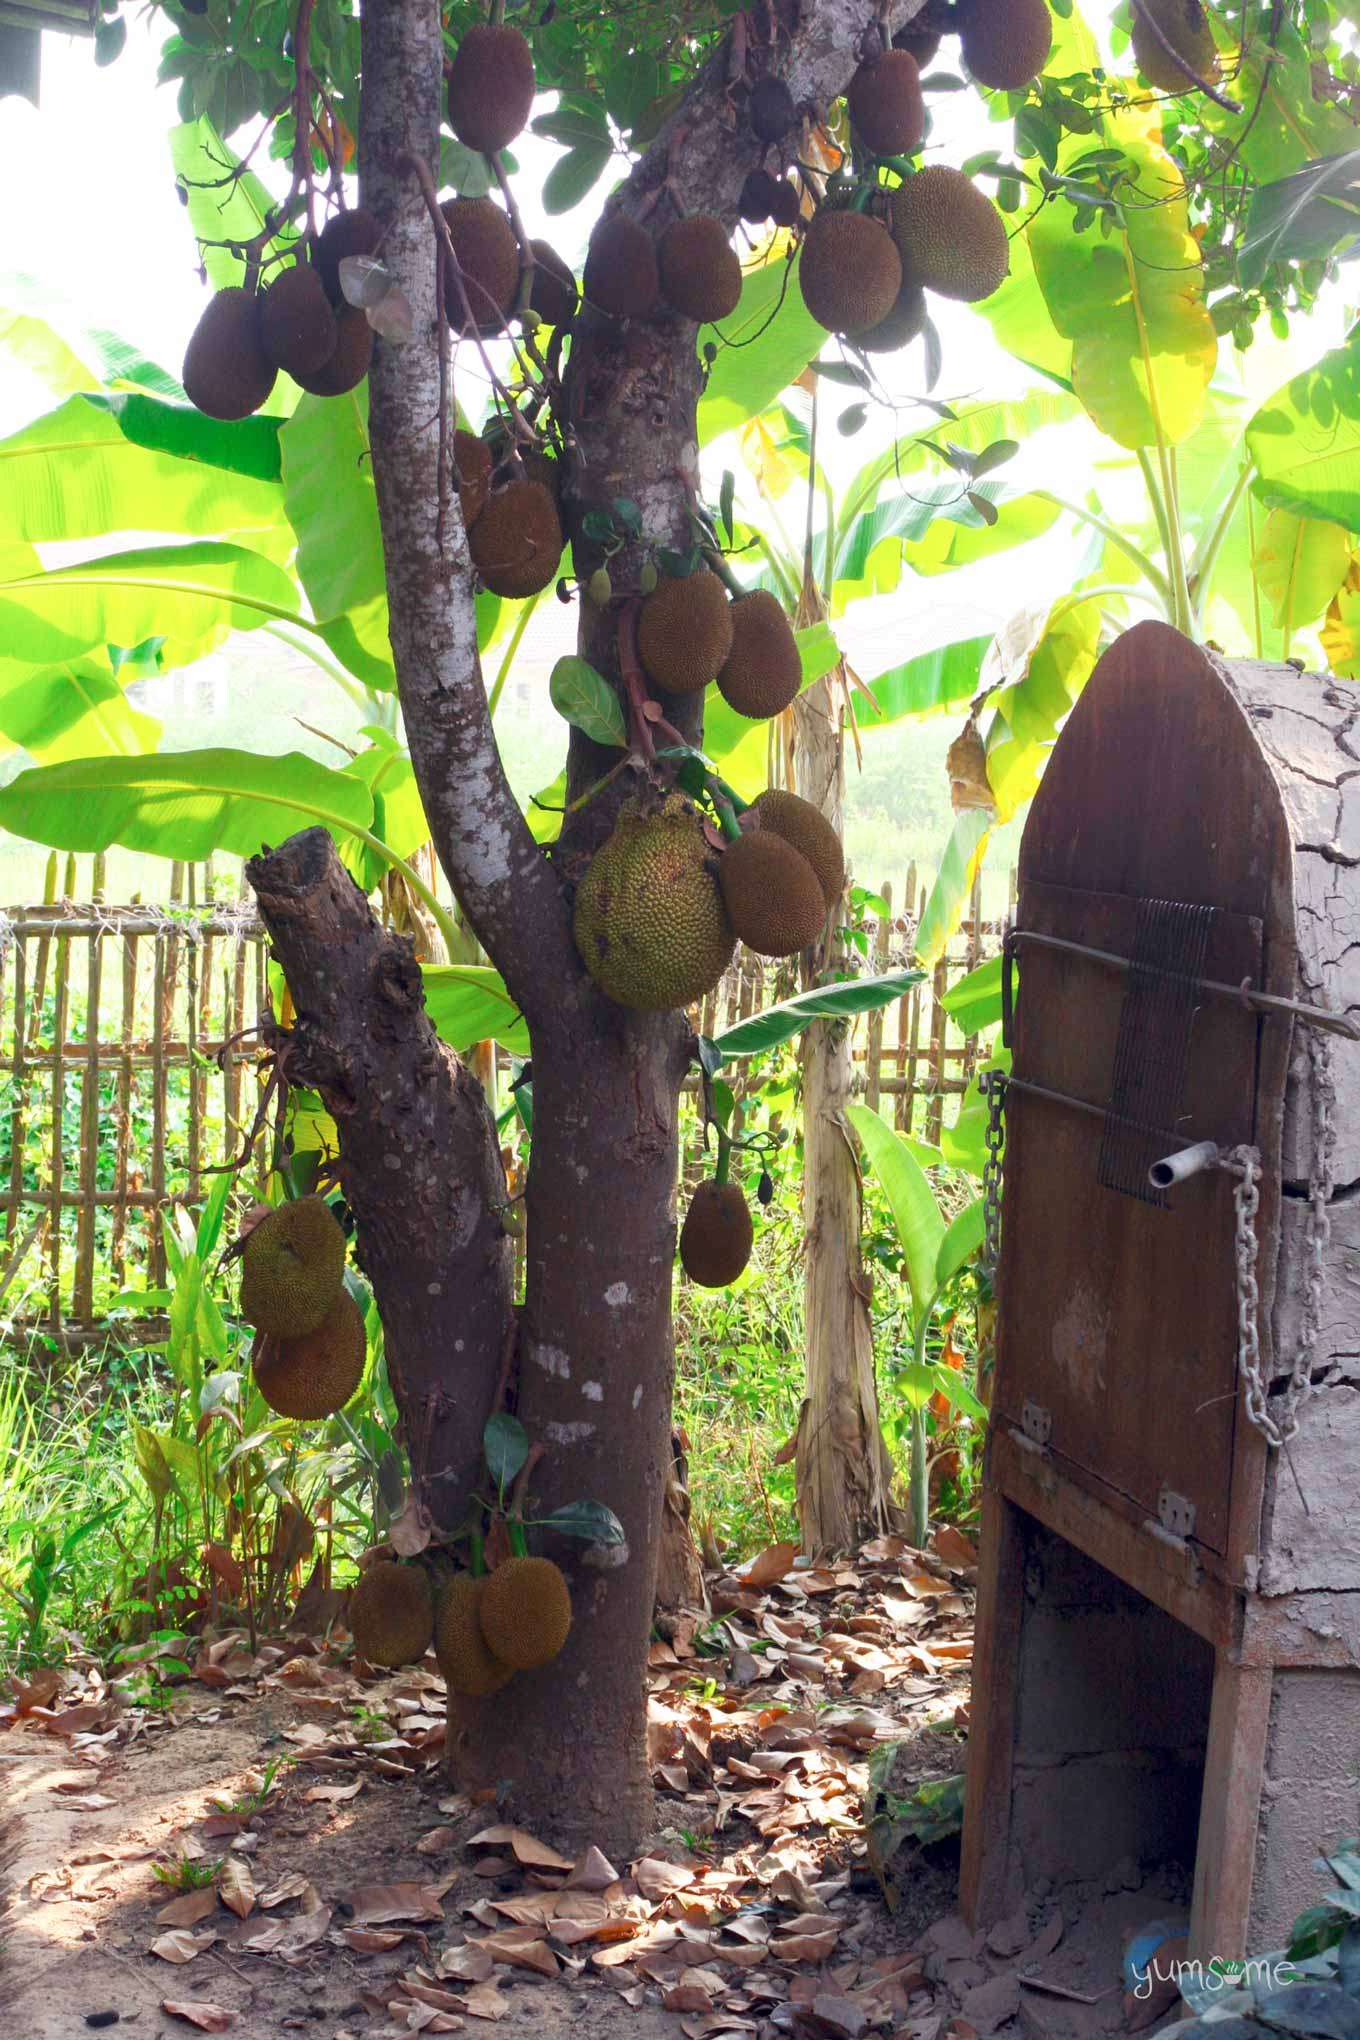 jackfruit tree in Doi Saket, Thailand | yumsome.com